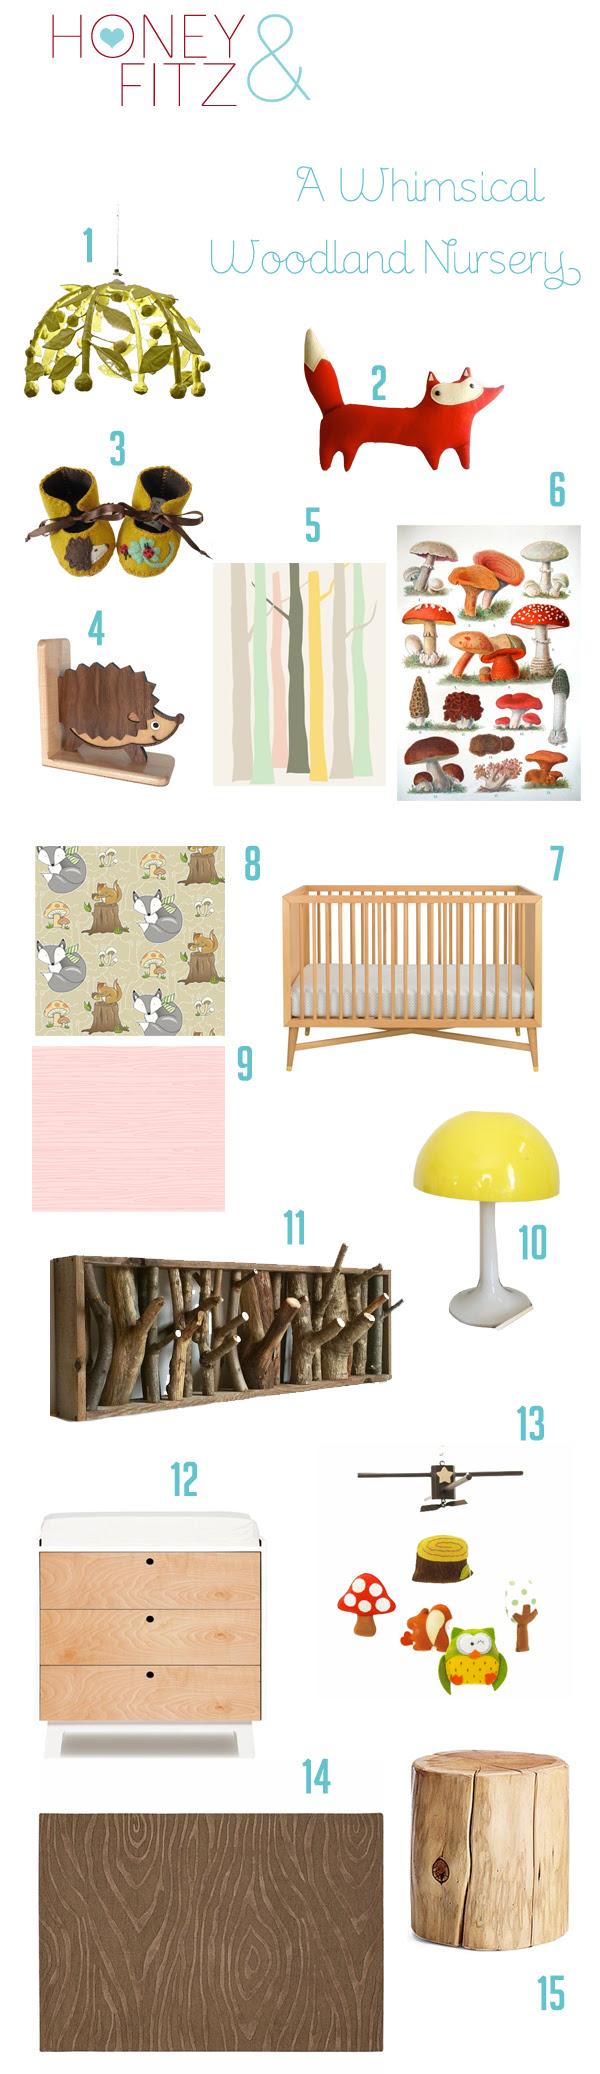 whimsical-woodland-nursery